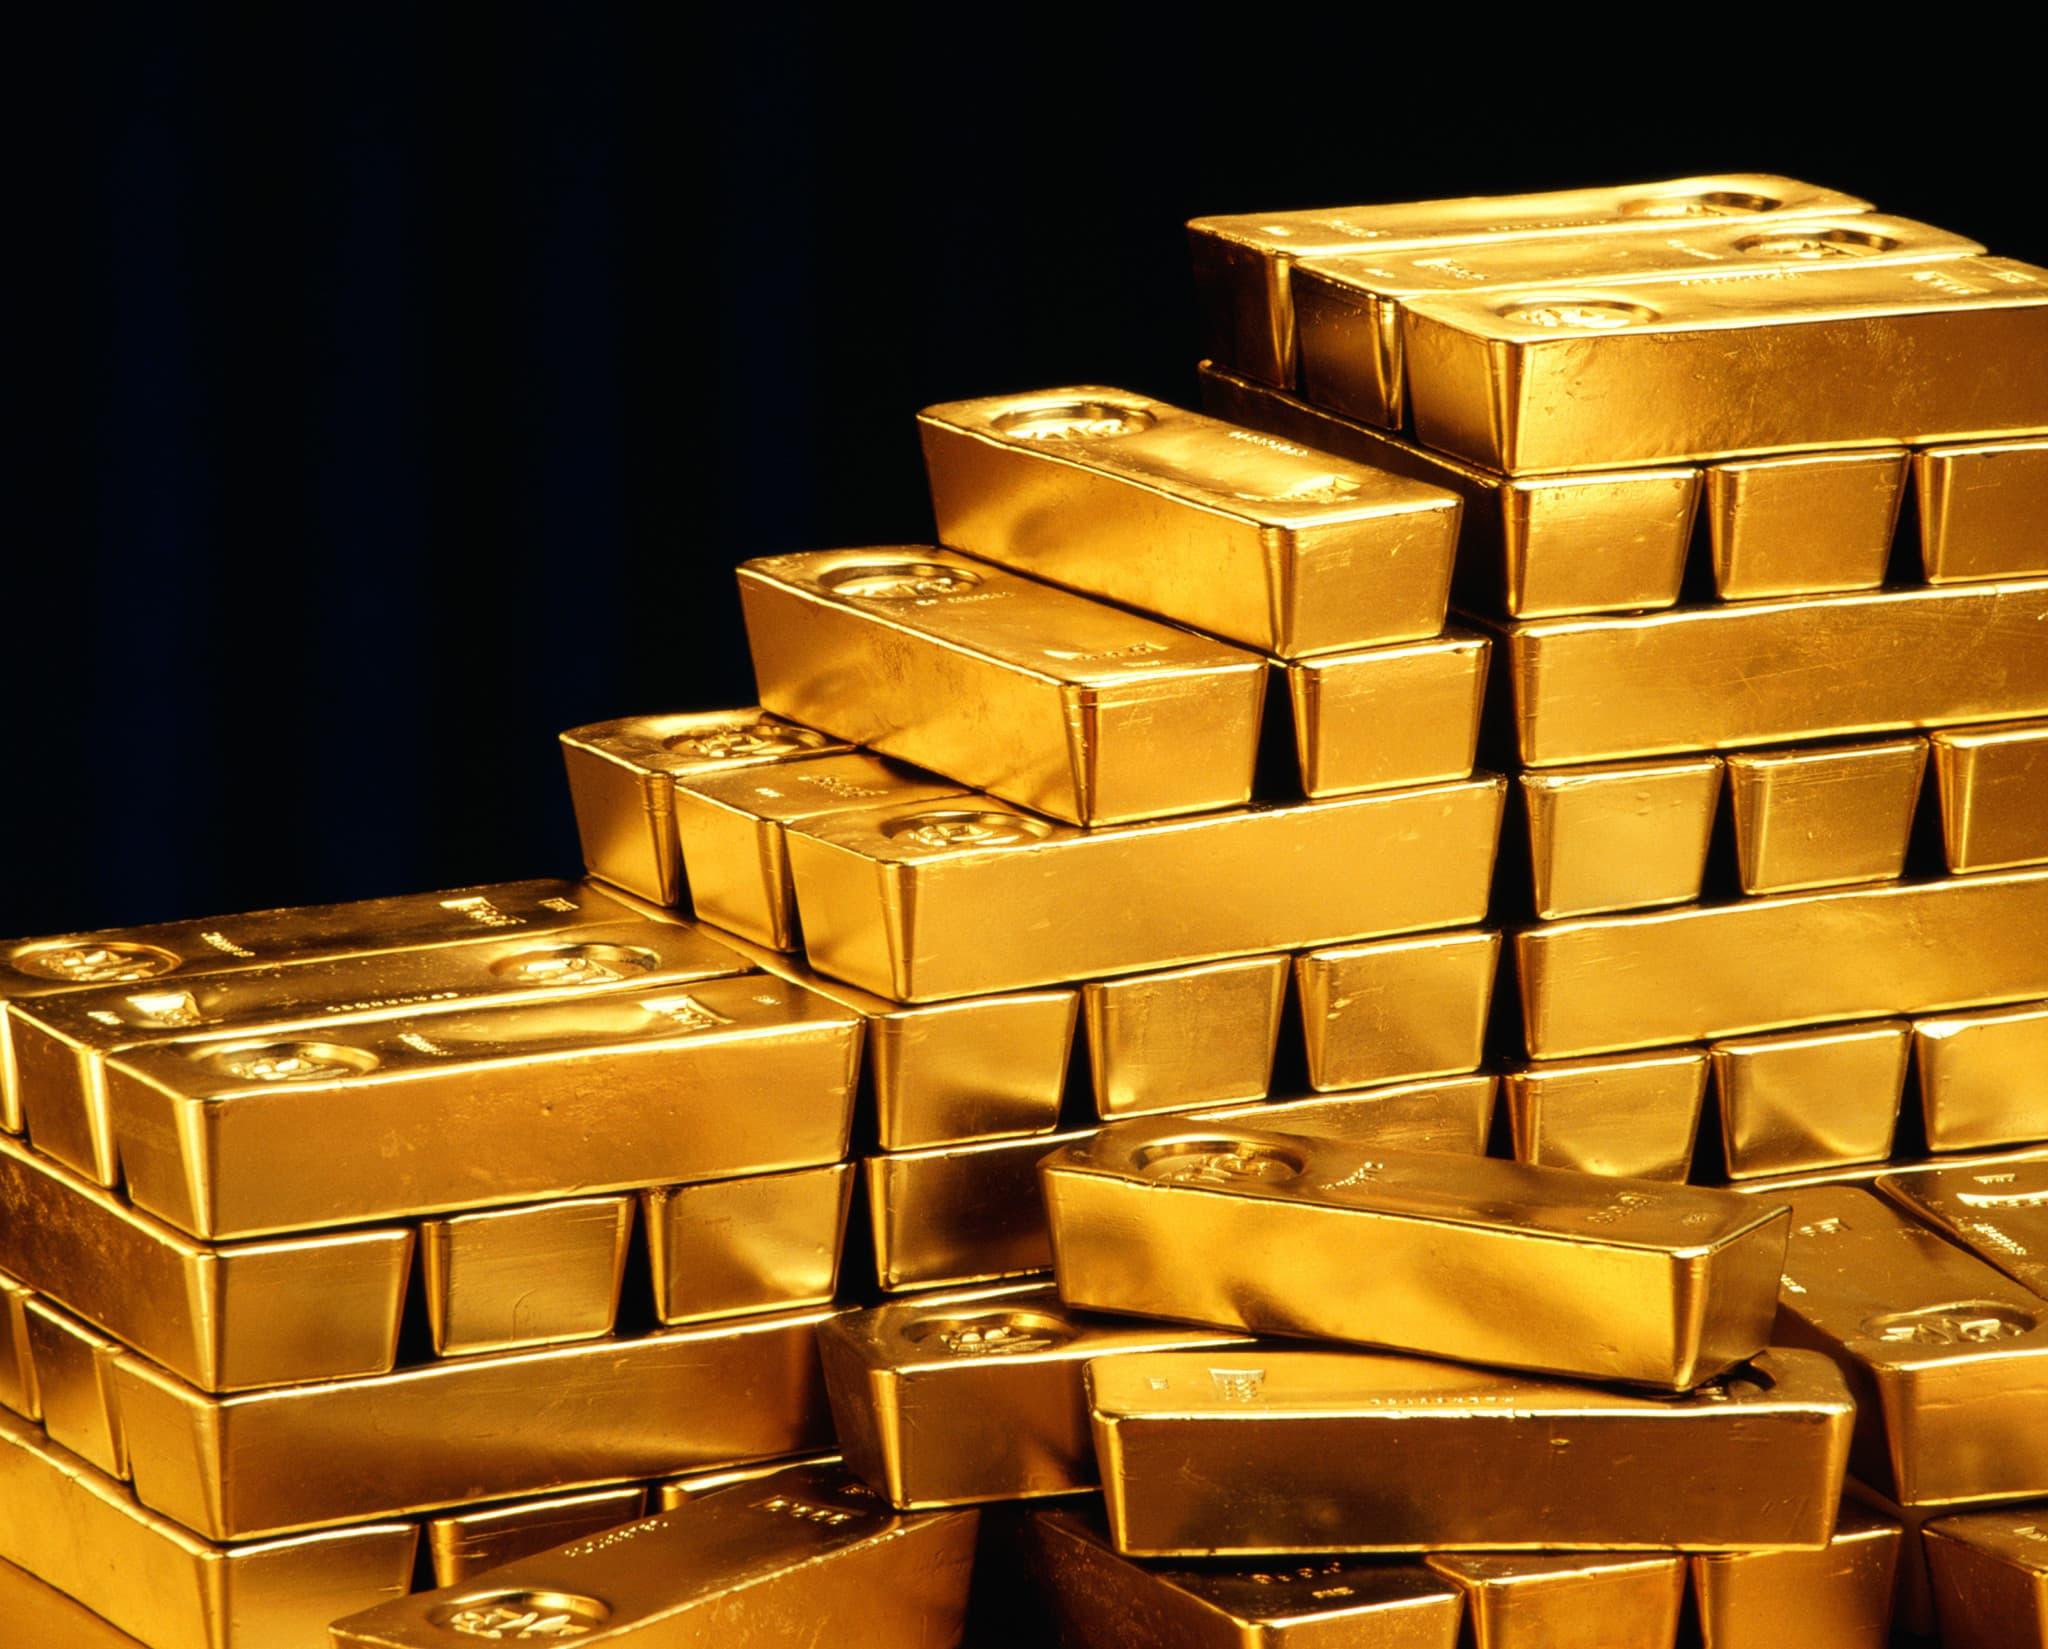 Reusable: gold stacks